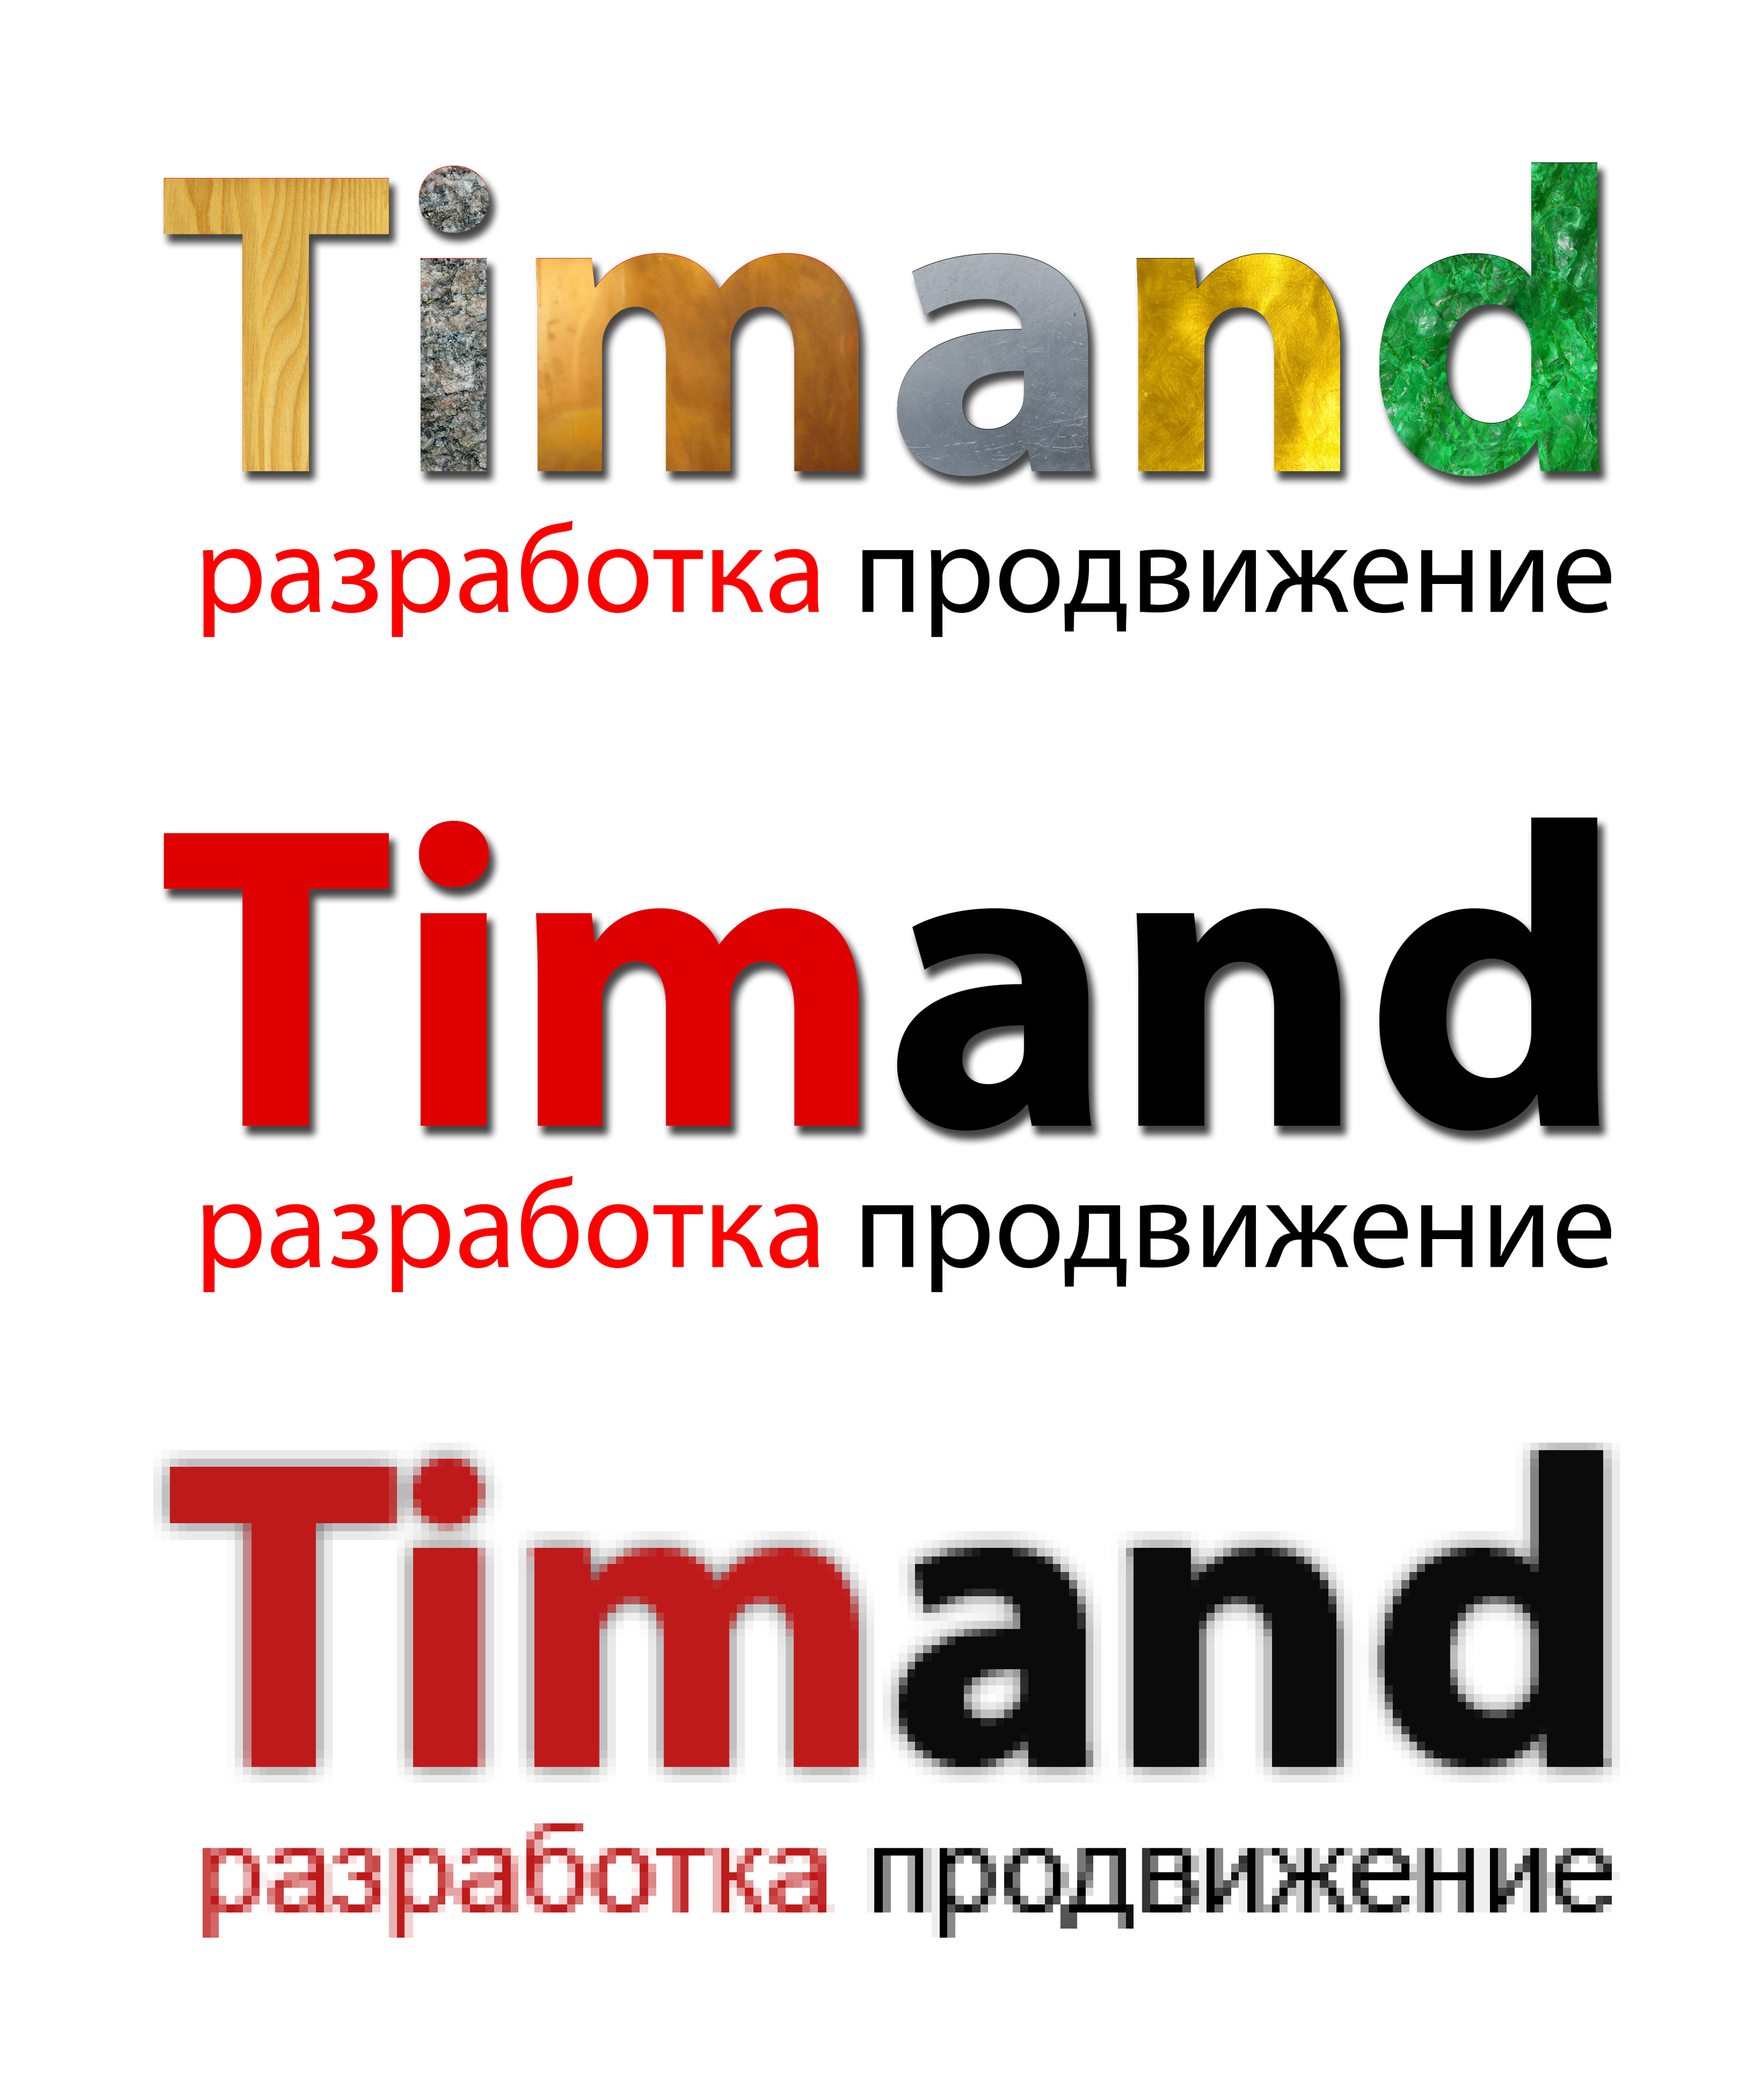 Отрисовка логотипа Timand